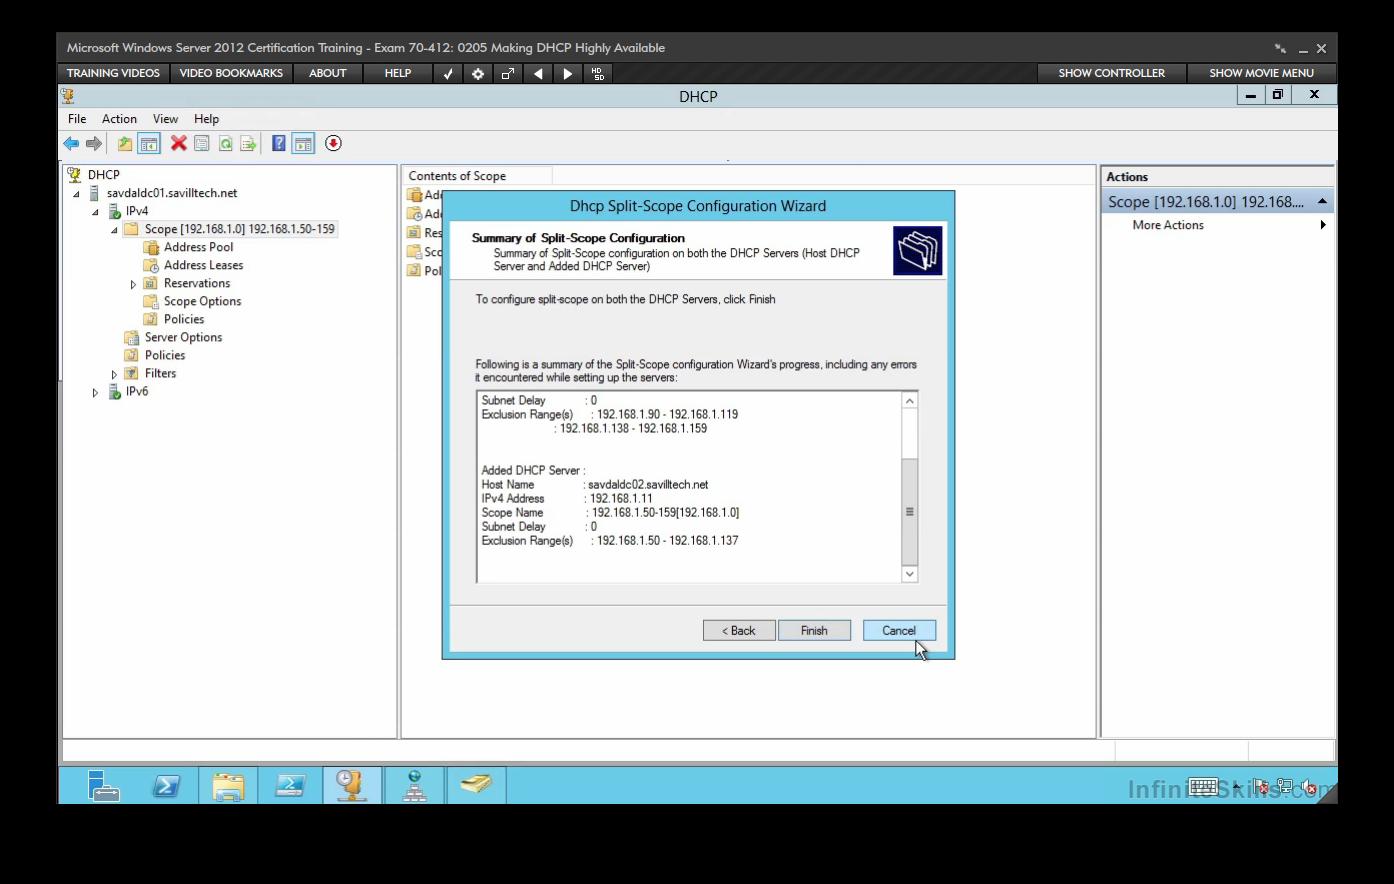 Amazon Learning Microsoft Windows 2012 Certification Exam 70